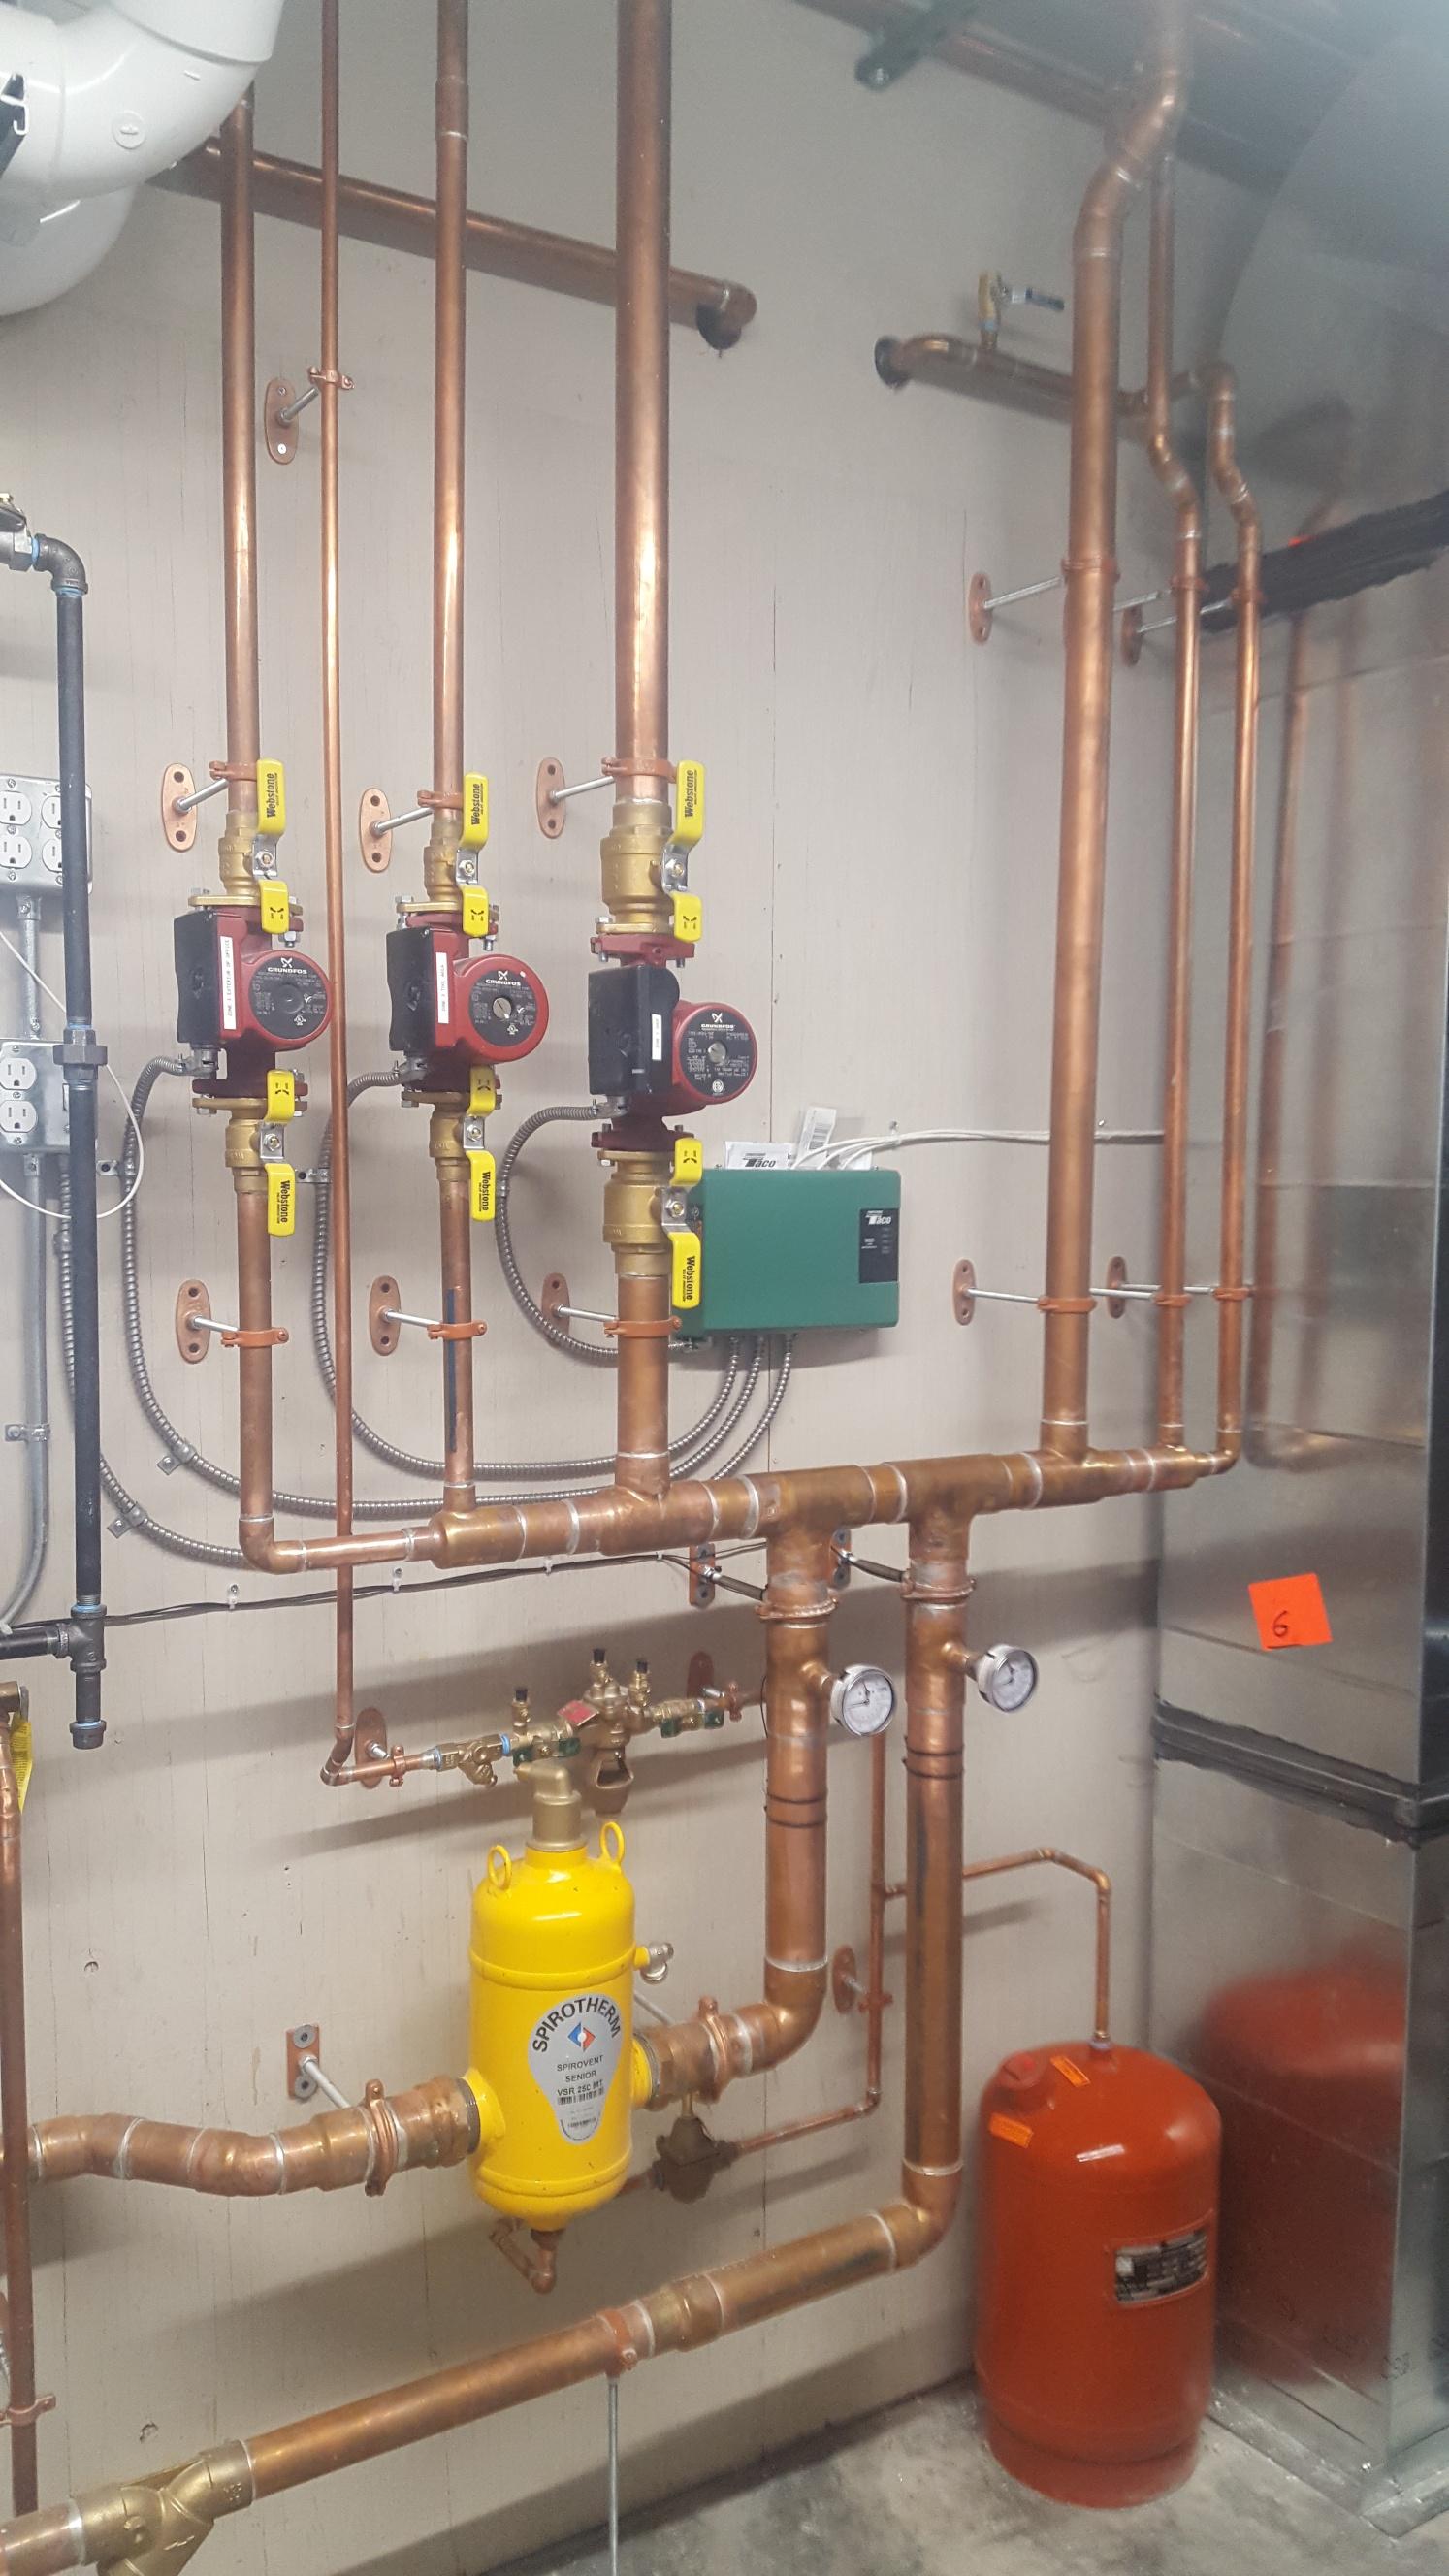 plumbing services cedar rapids dubuque iowa city brecke